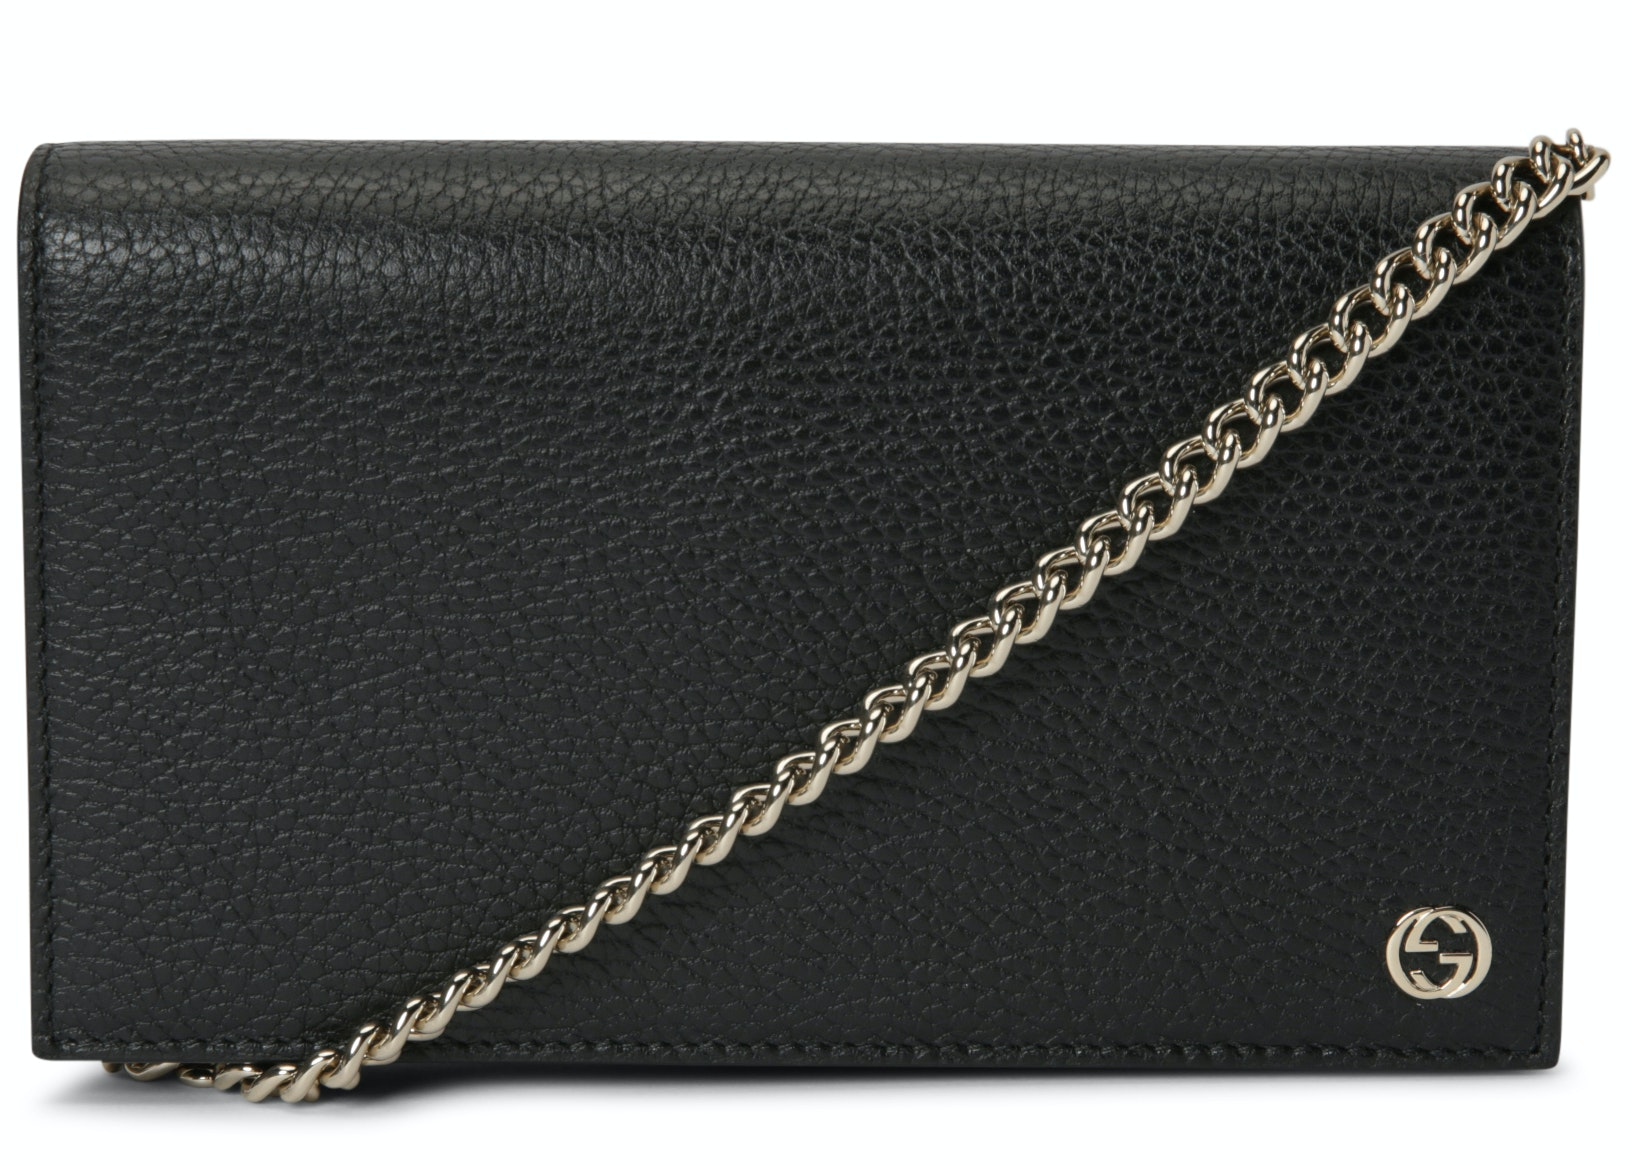 Gucci Chain Wallet Betty GG Medium Black